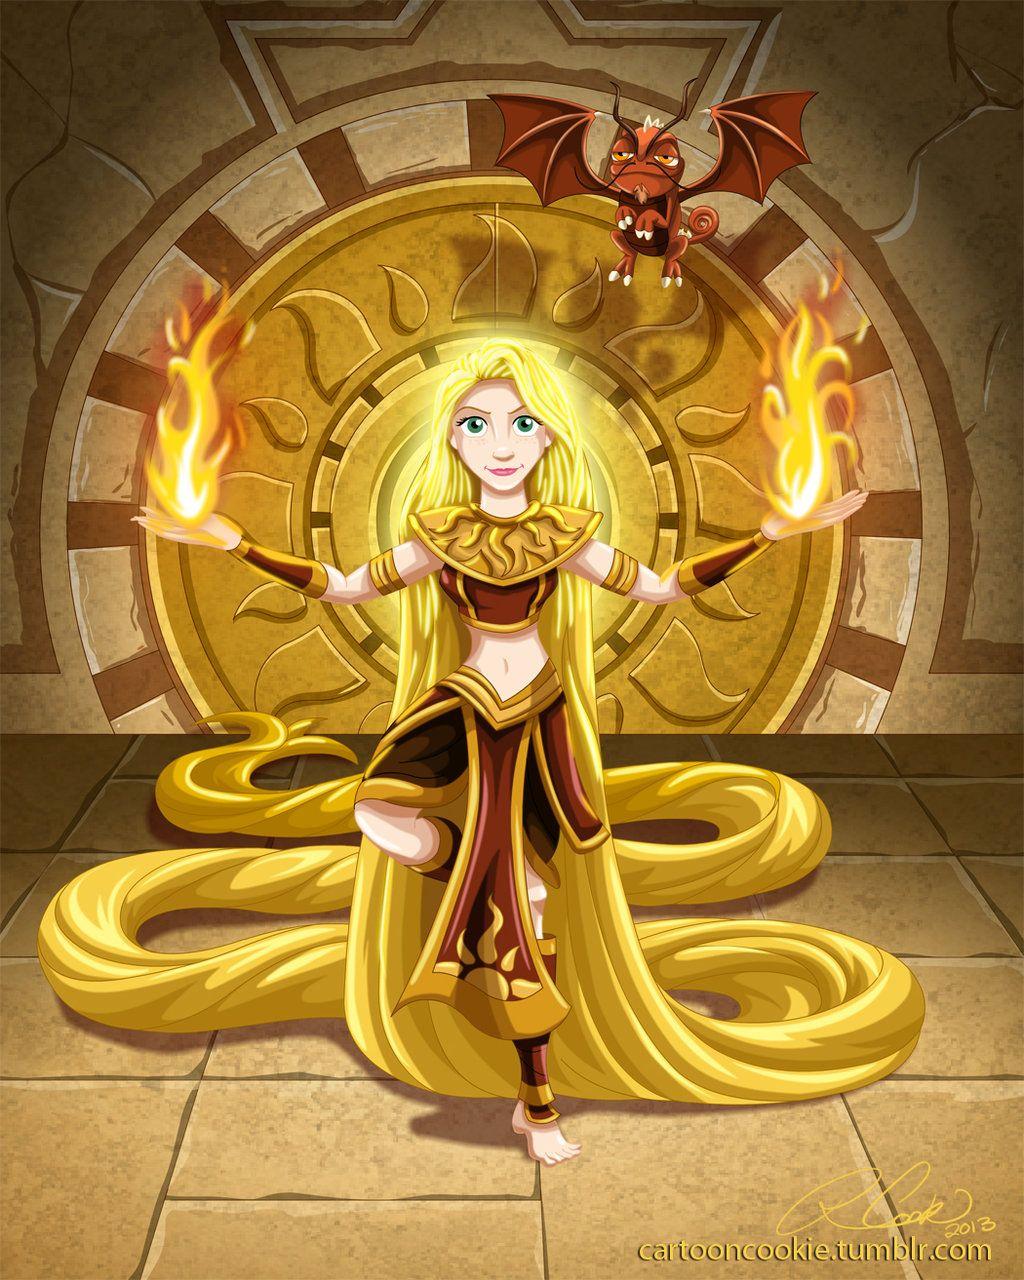 Racookie3's Disney Princess in Avatar: The Last Airbender: Sun Warrior Firebender Rupunzel